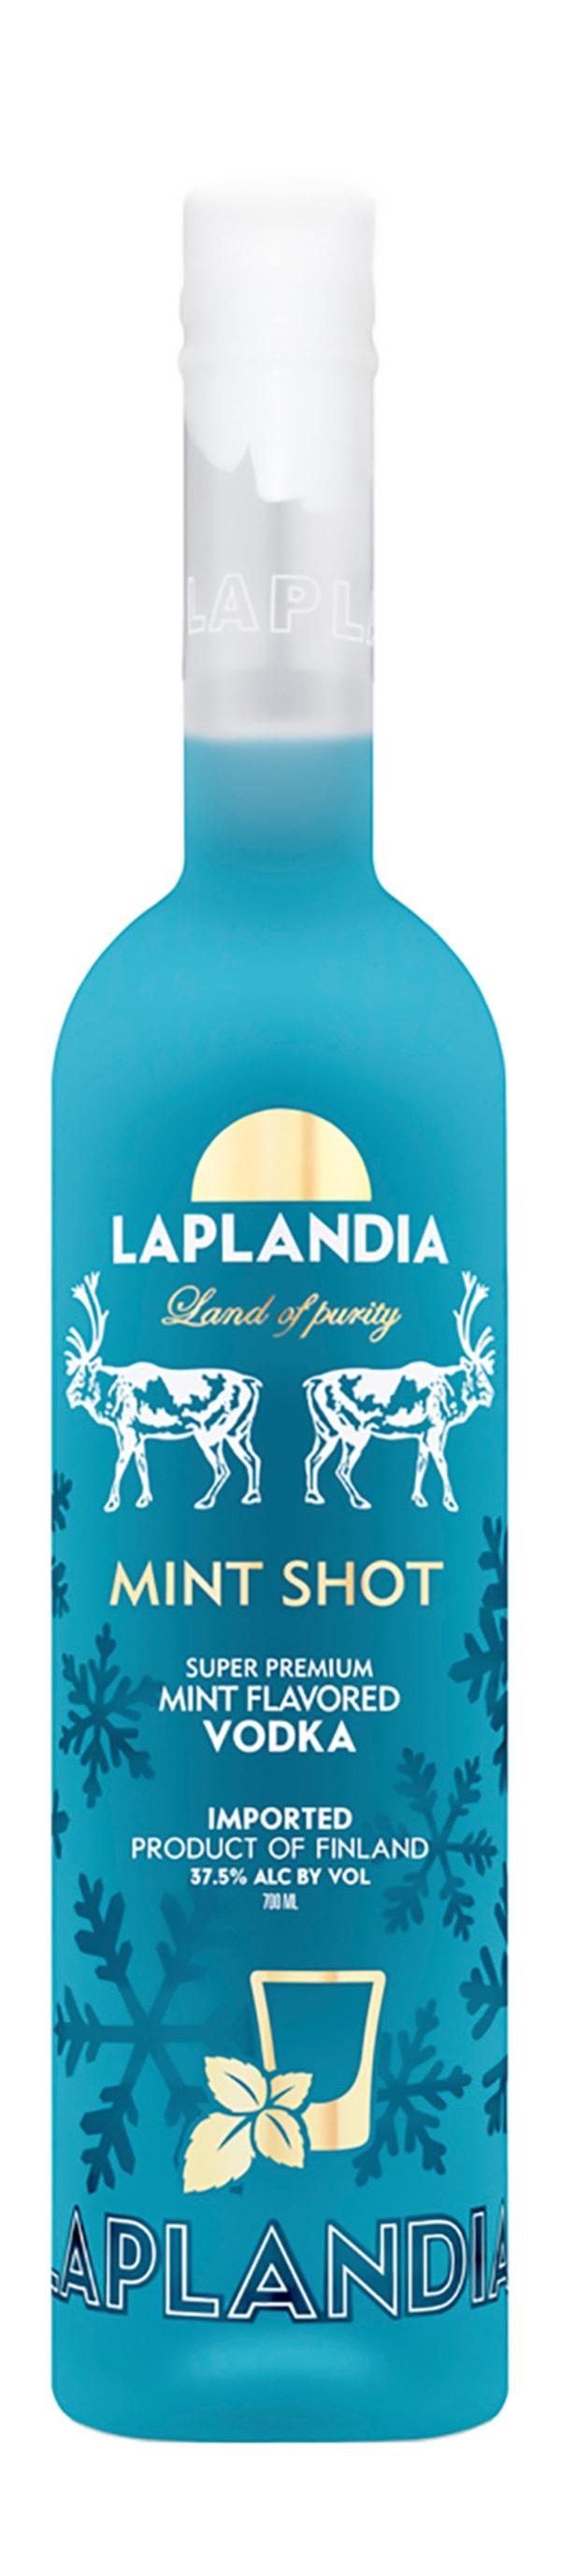 Laplandia Mint Shot Vodka